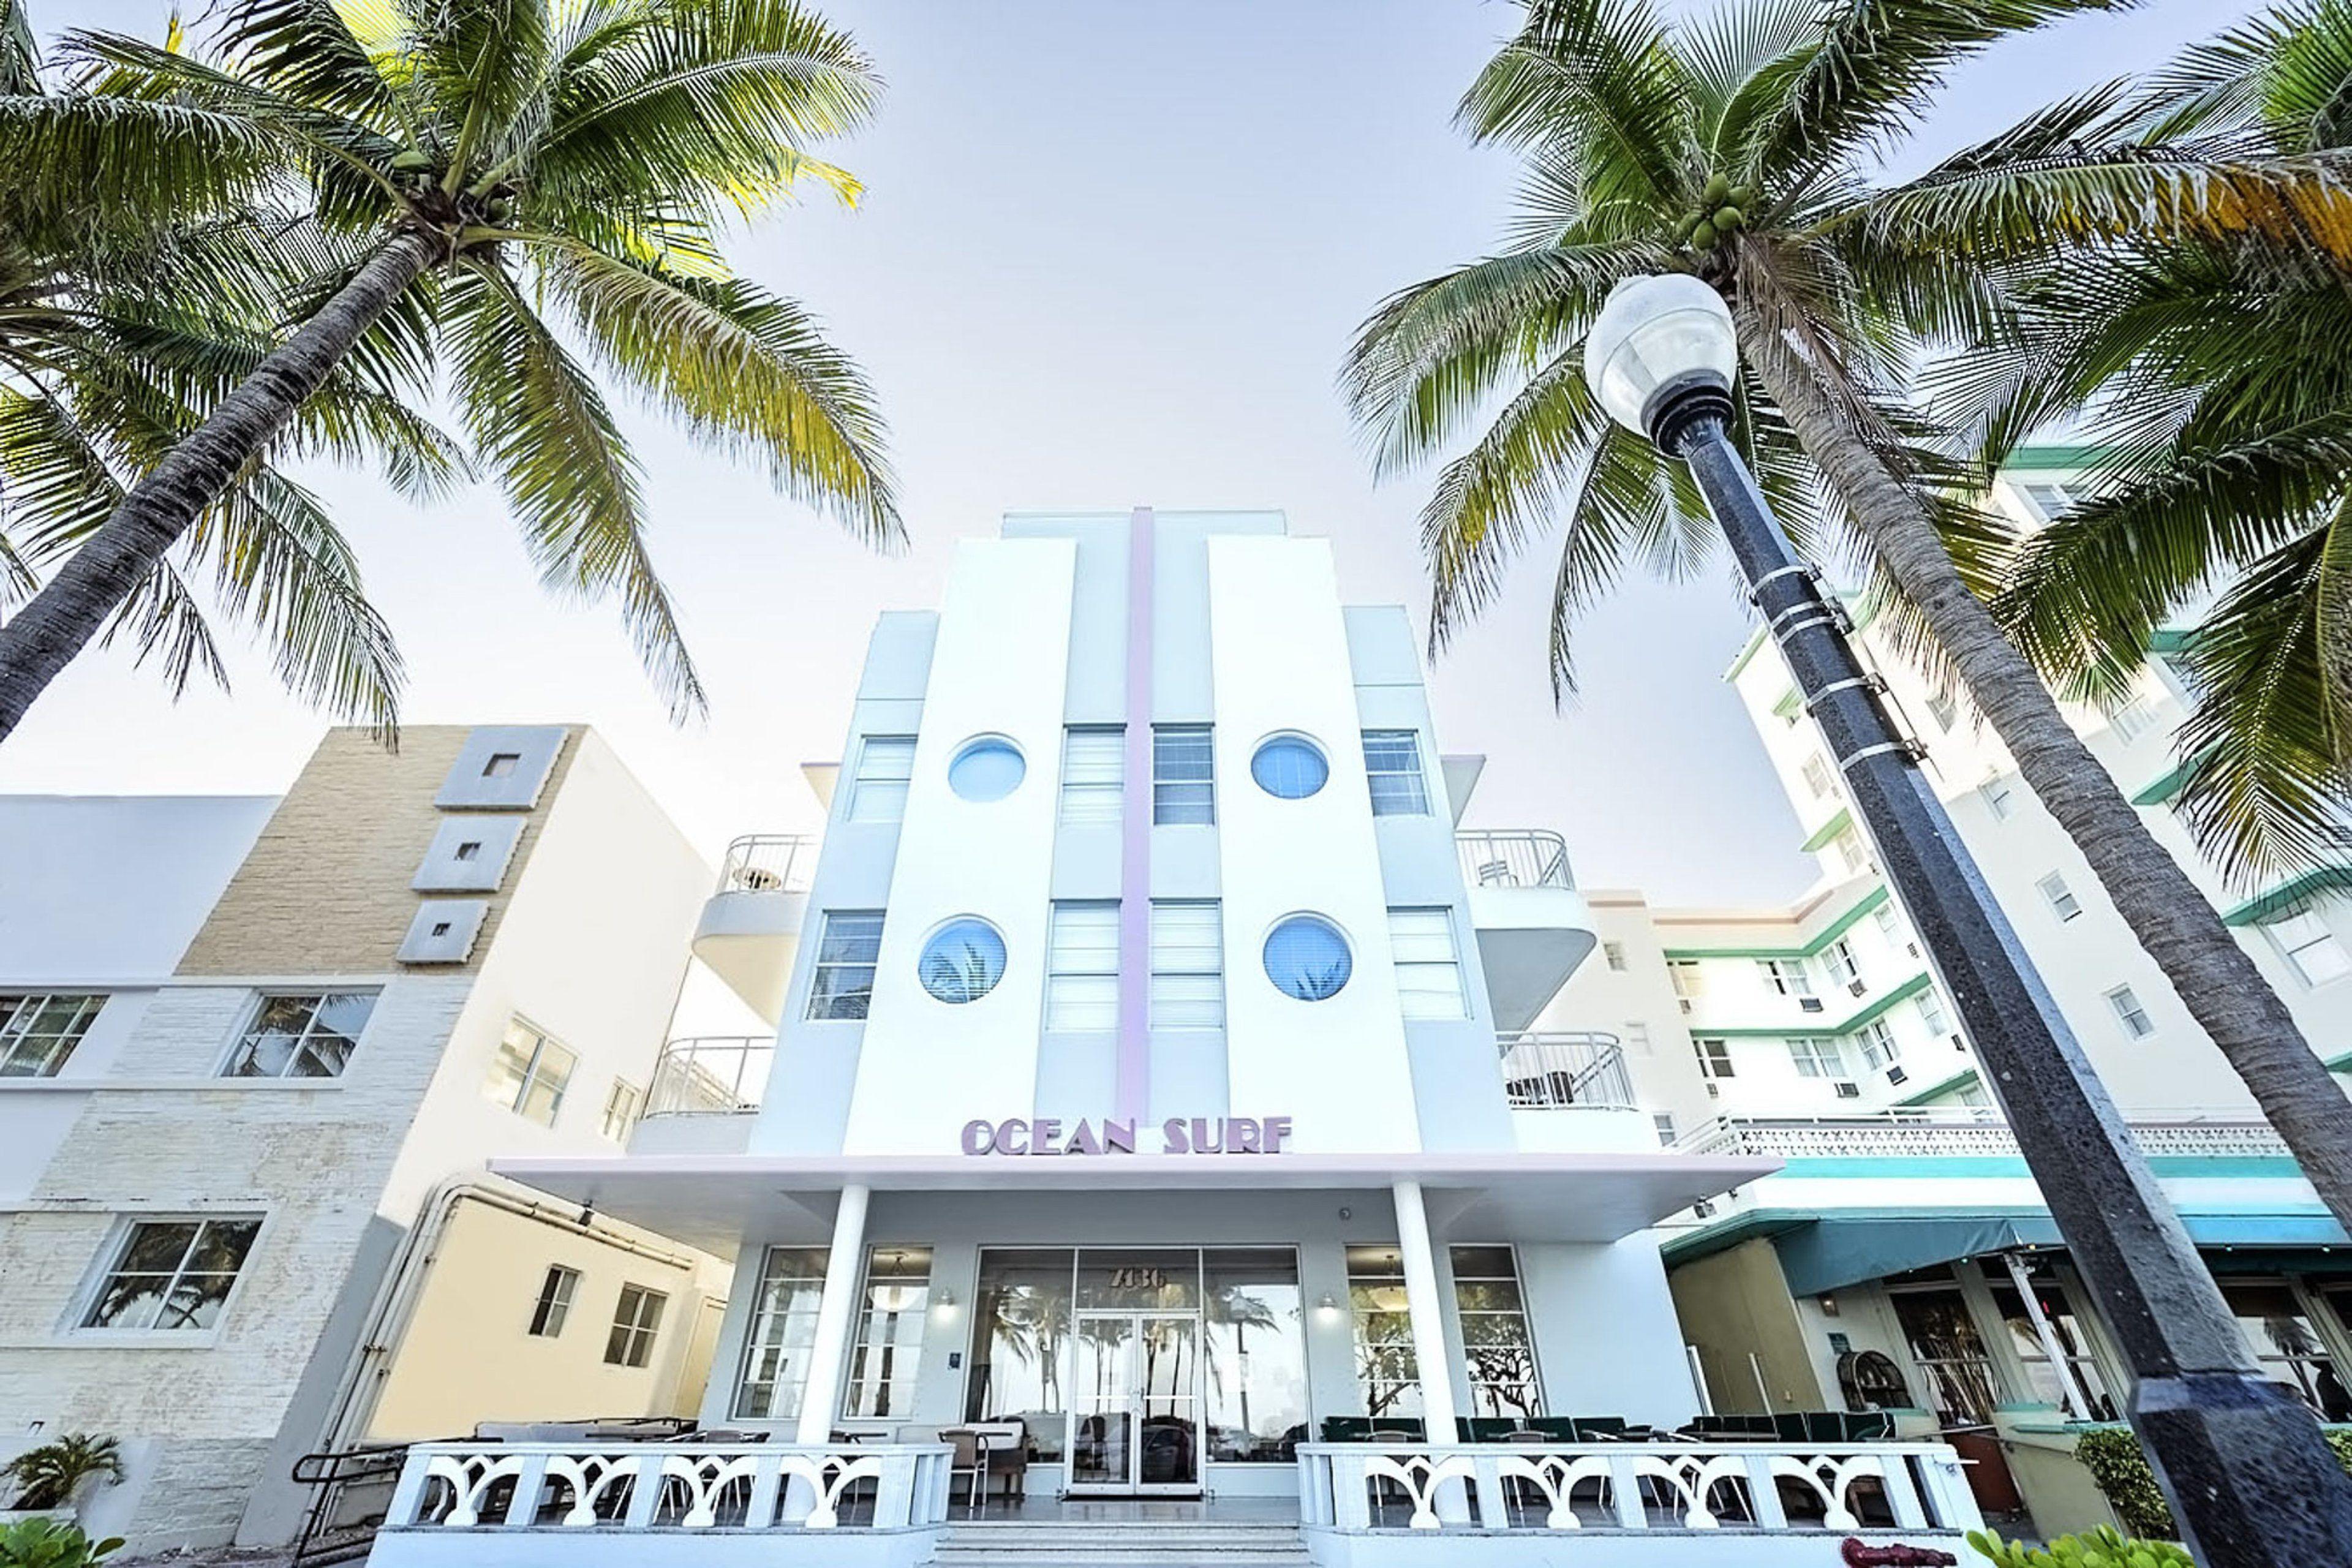 Ocean Surf Hotel